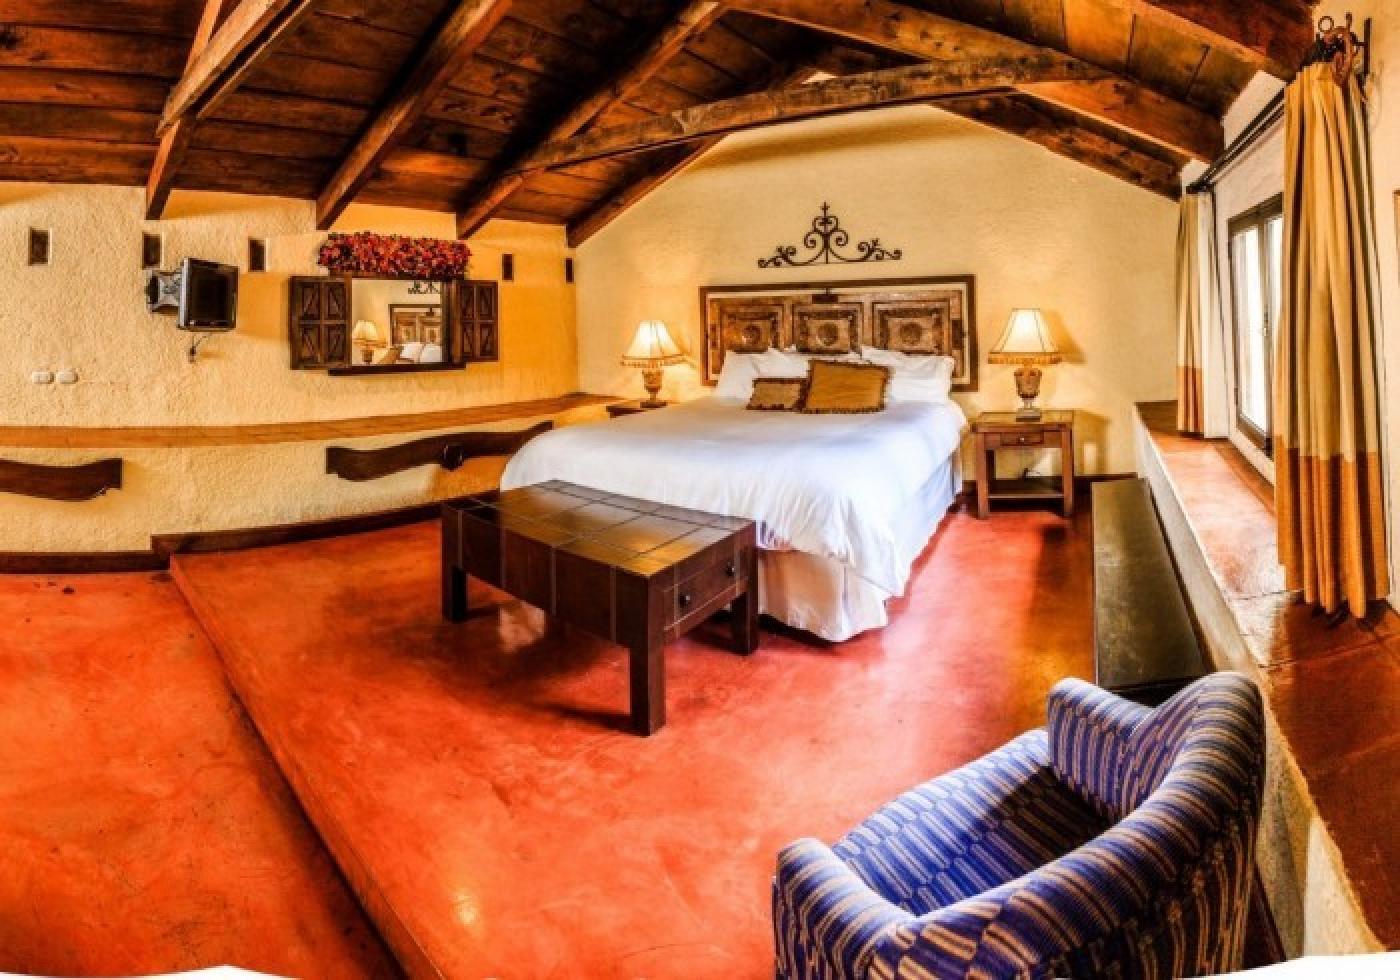 Hotel Lo De Bernal Bed and Breakfast